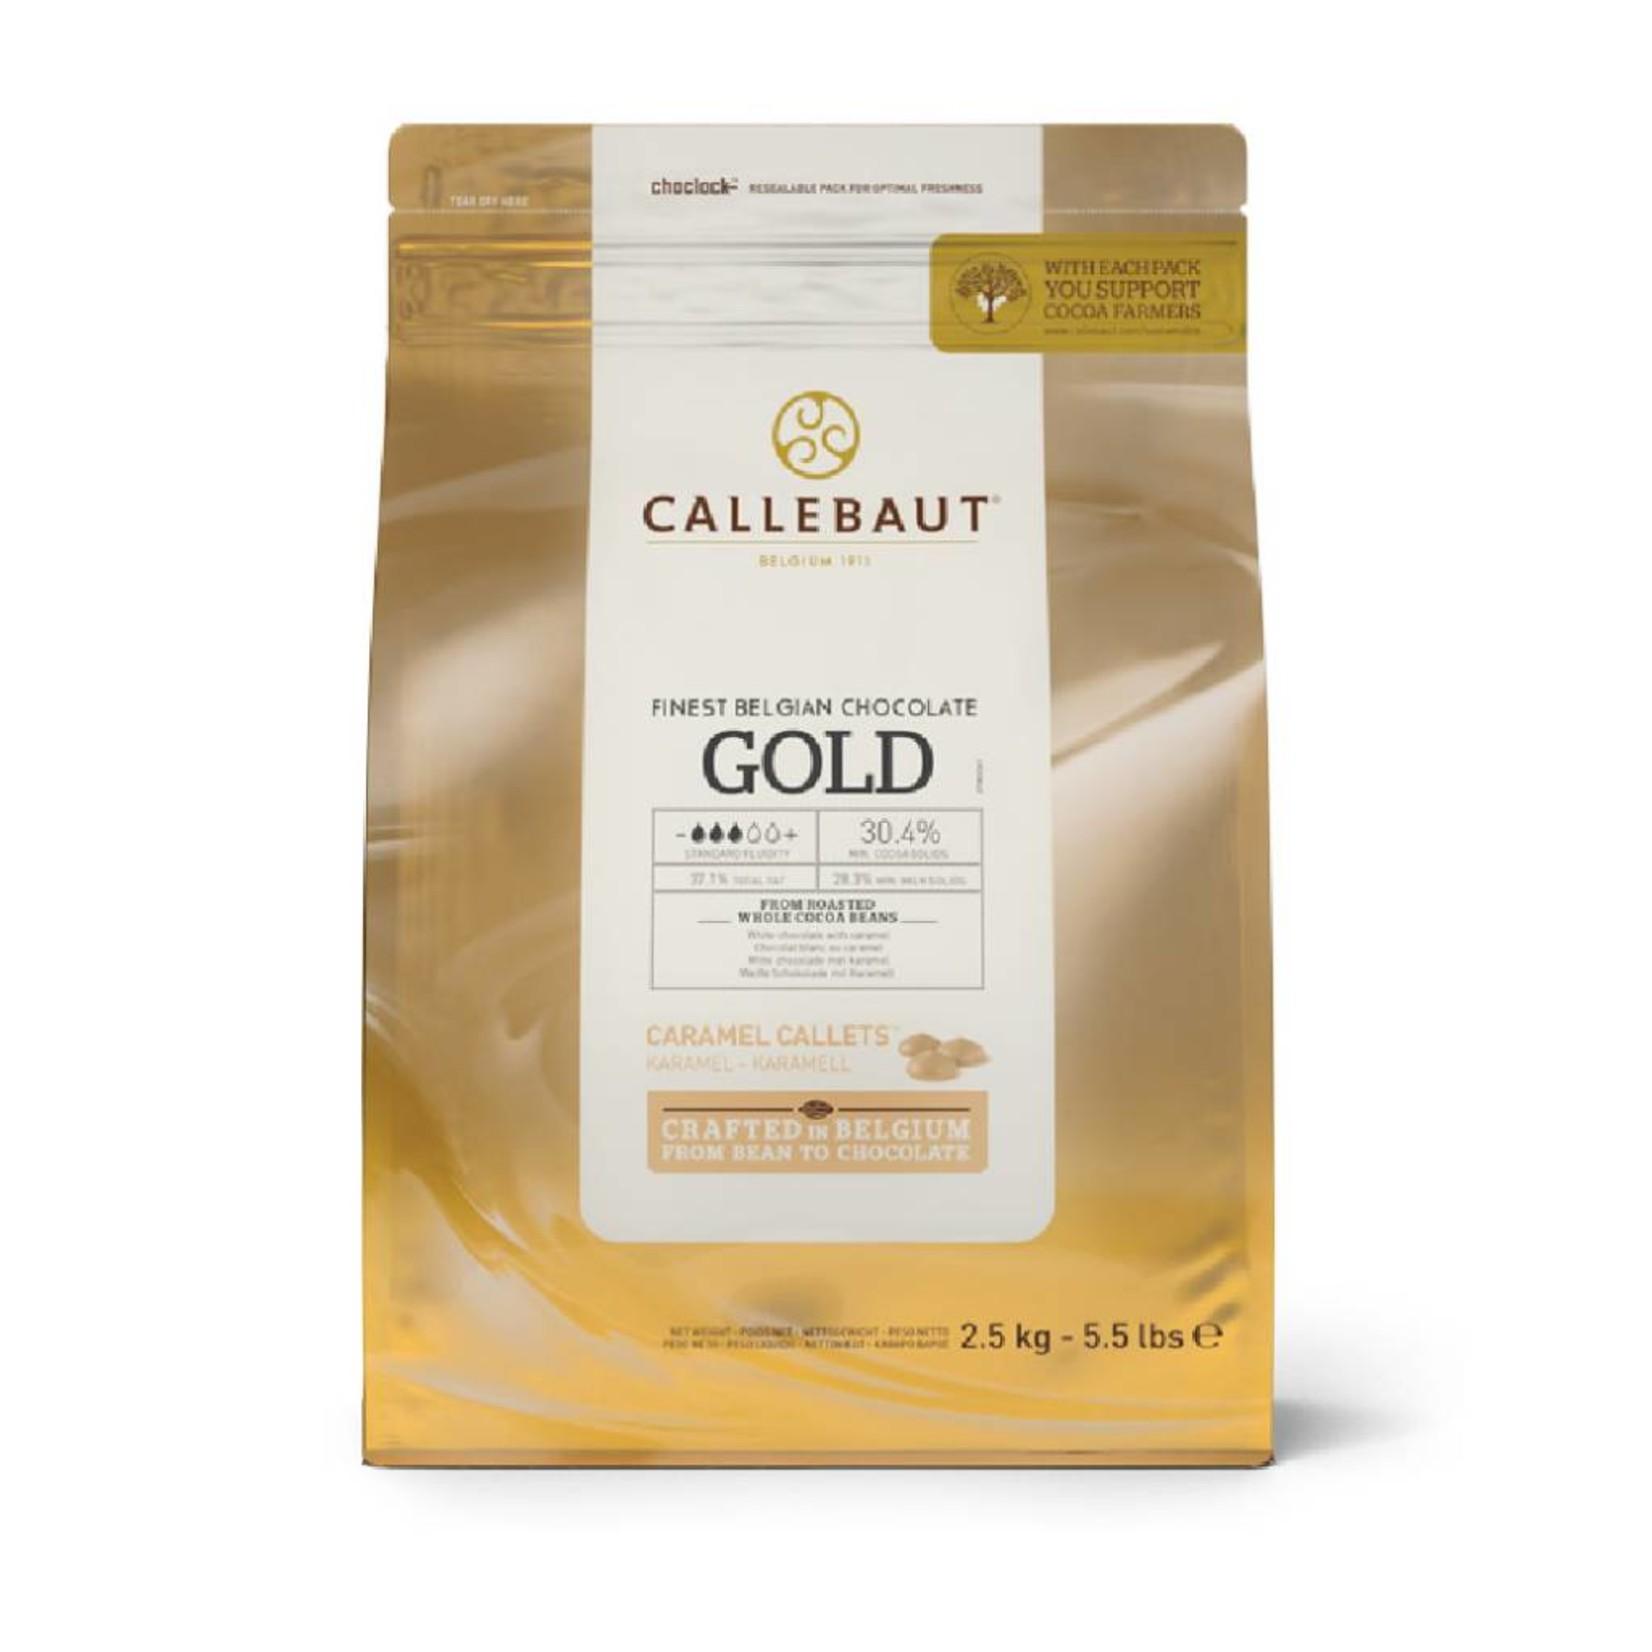 Barry Callebaut Barry Callebaut - Gold Caramel White Chocolate 30.4% - 2.5kg/5.5lb, CHK-R30GOLD-2B-U75